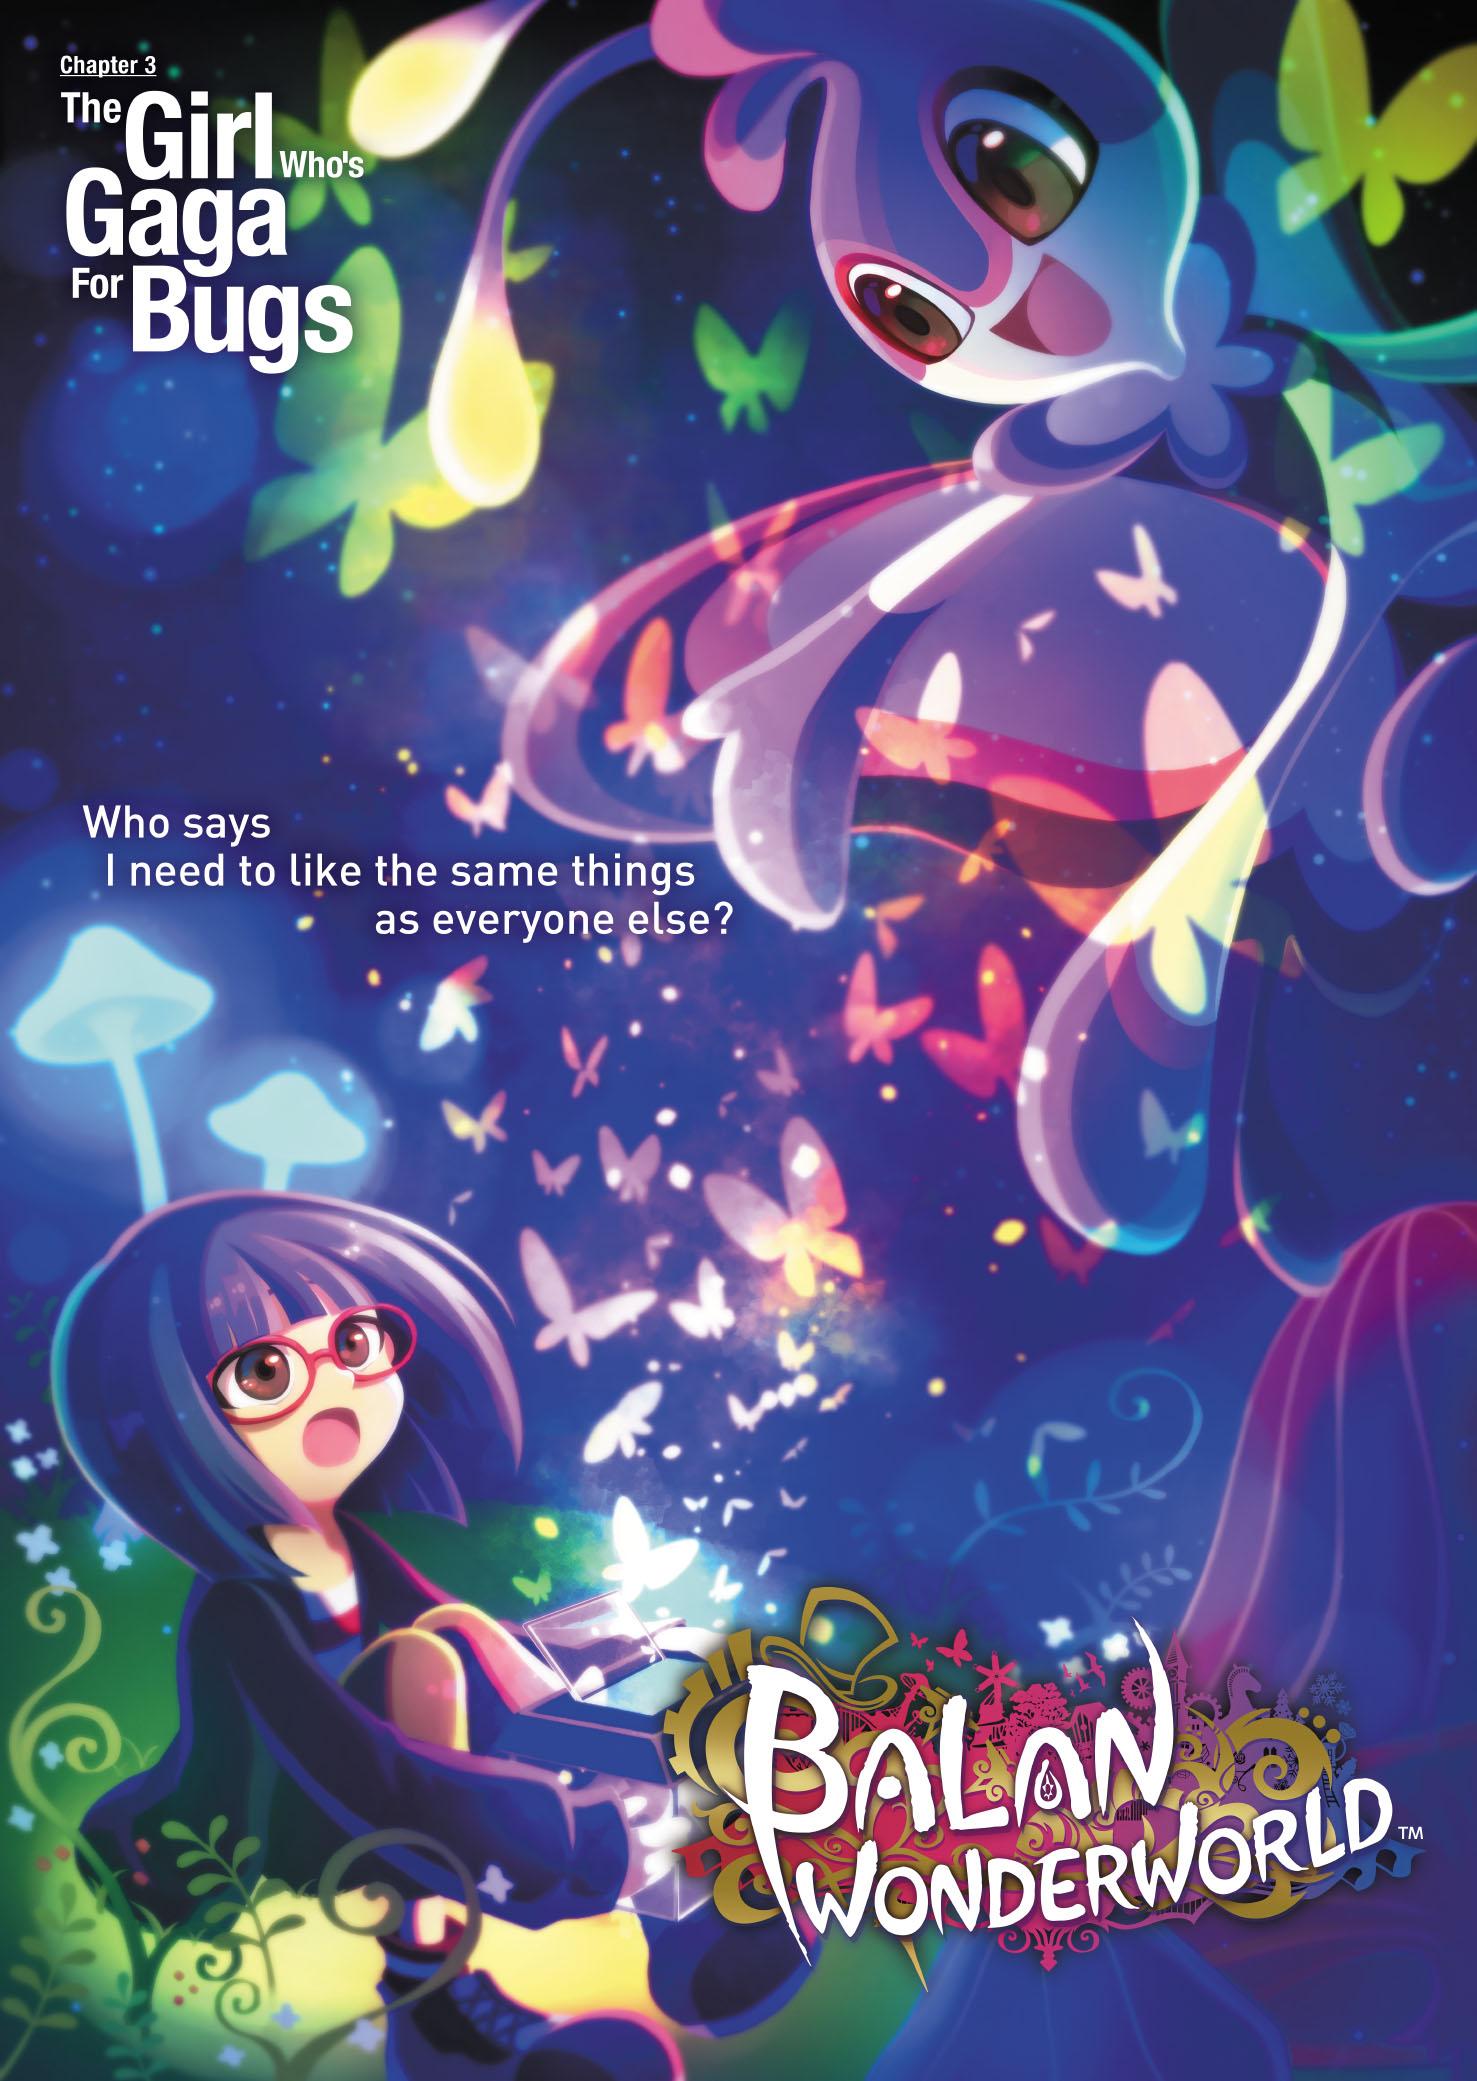 Balan Wonderworld Chapter 3 The Girl Who%u2019s Gaga for Bugs Poster